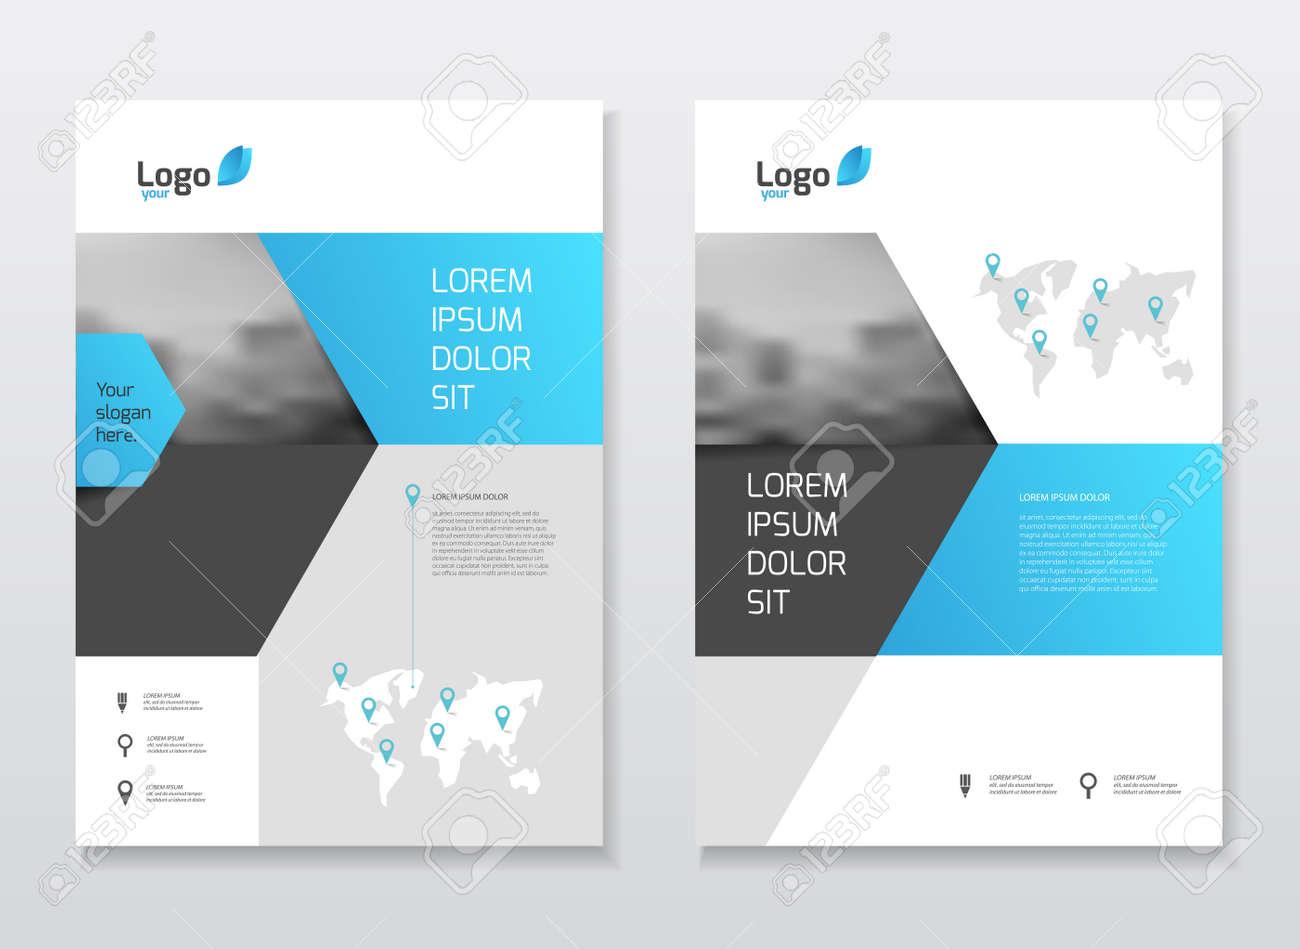 abstract business brochure design vector template in a size abstract business brochure design vector template in a4 size document or book cover annual